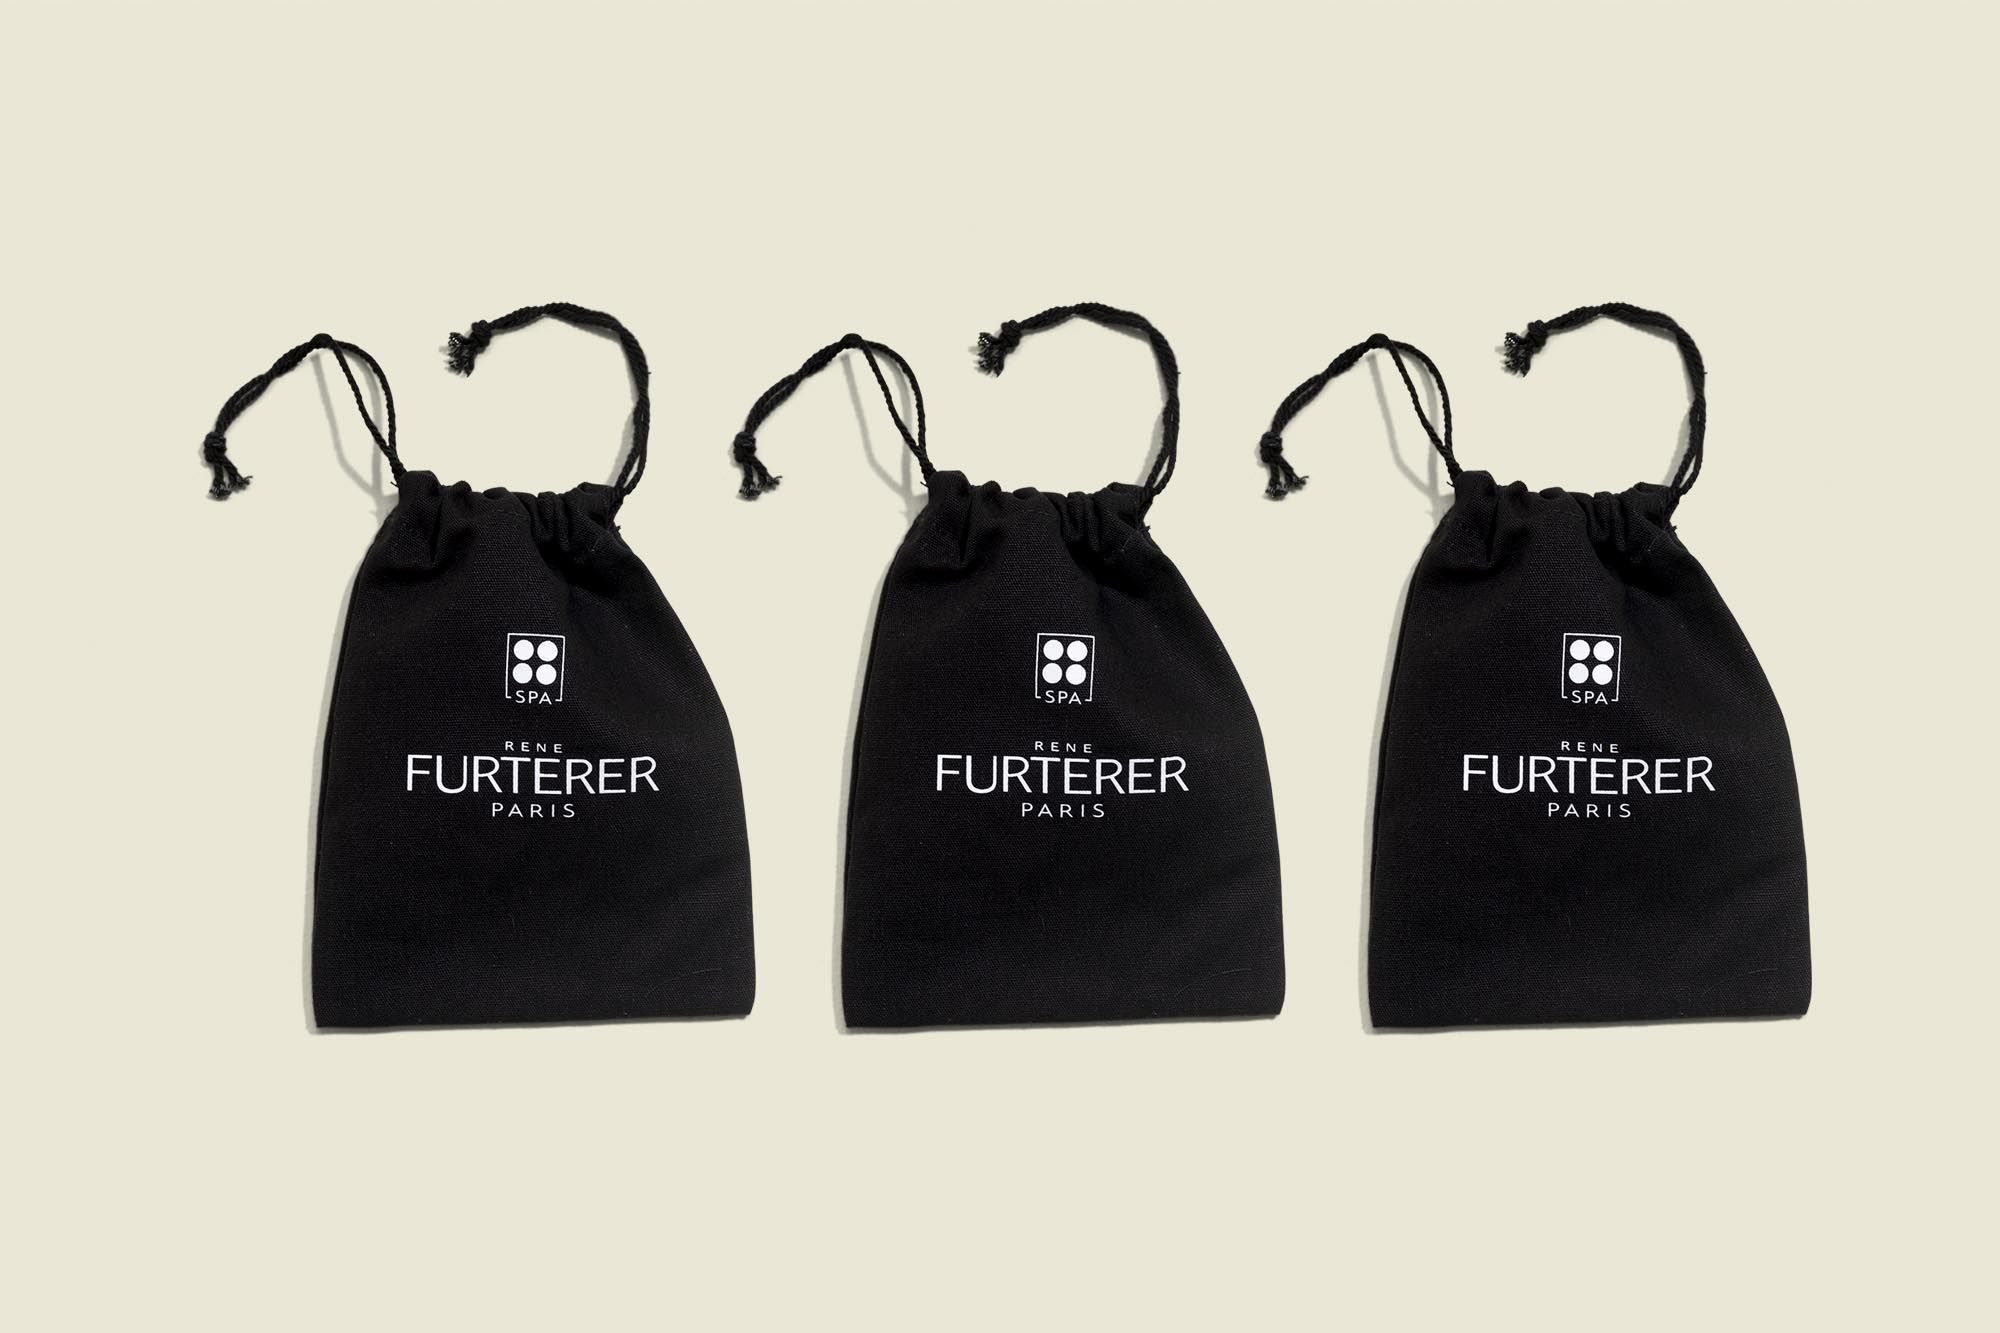 3 Drawstring pouches